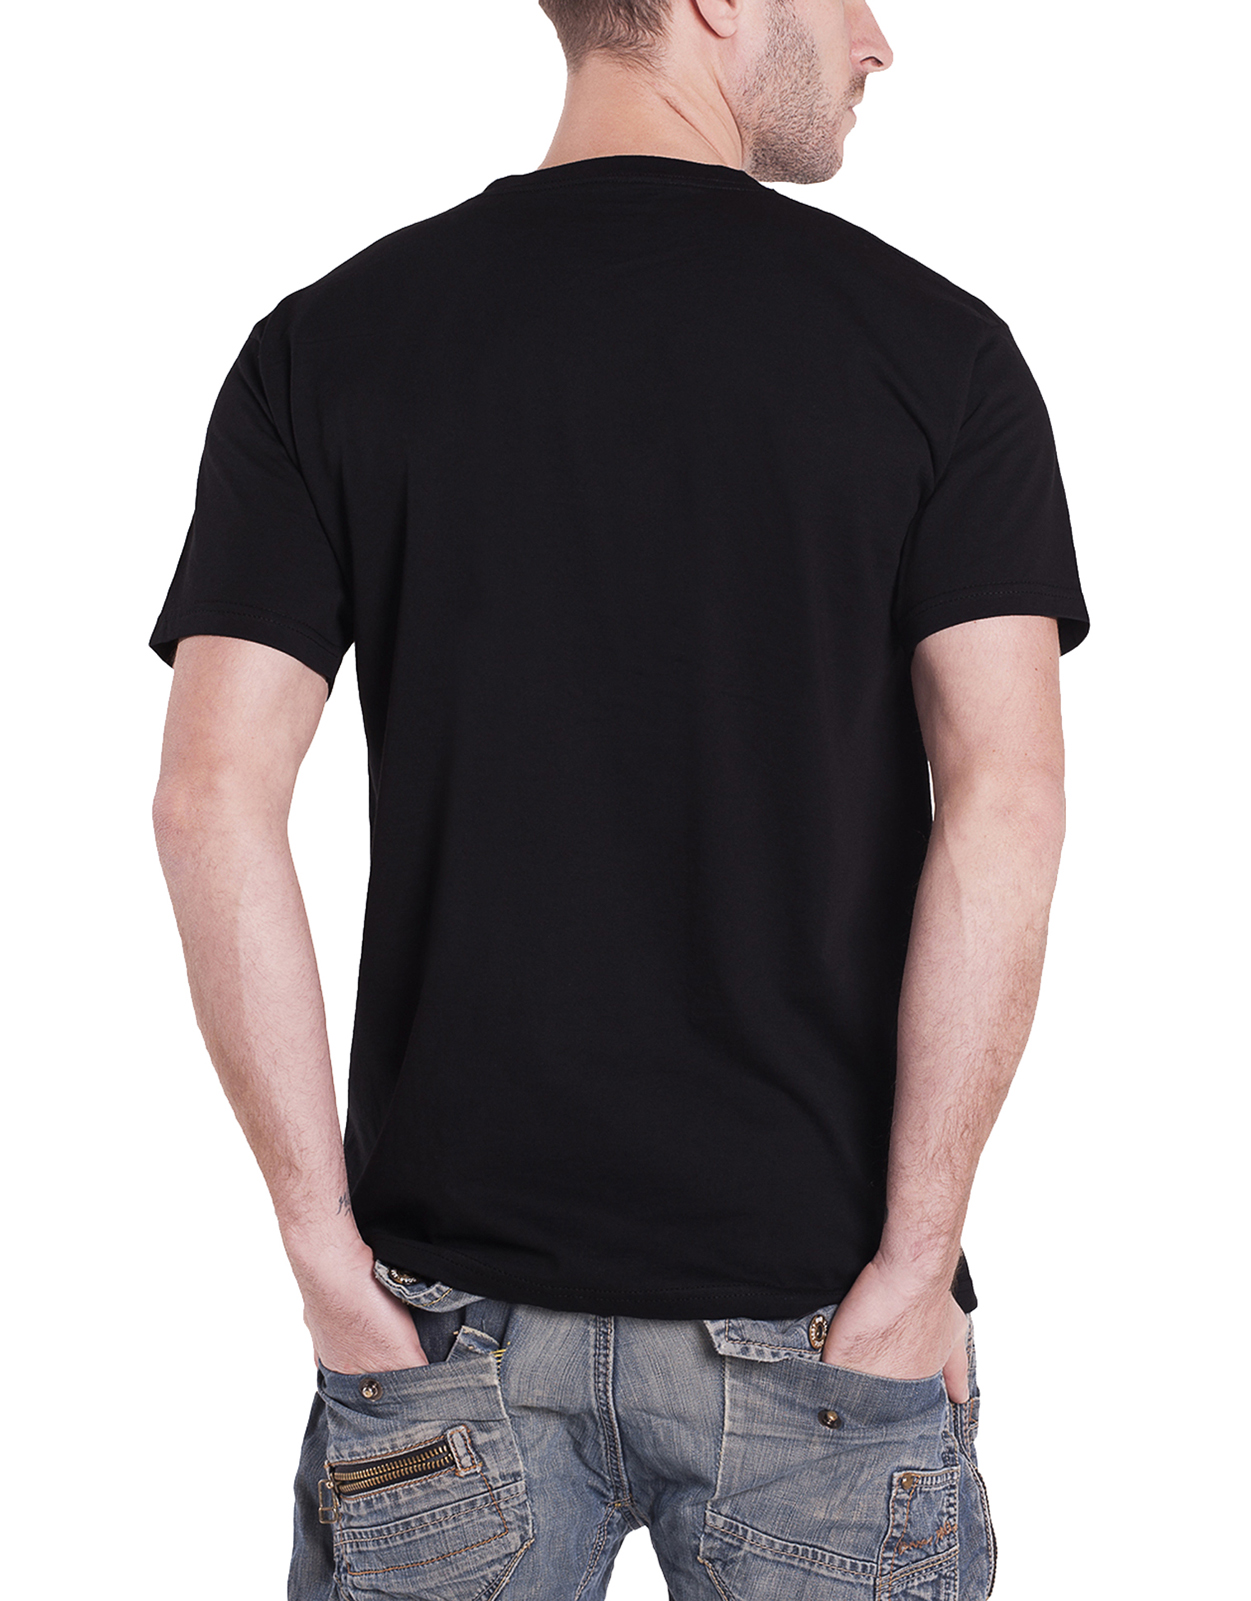 Motorhead-T-Shirt-Lemmy-RIP-England-warpig-clean-your-clock-official-new-mens Indexbild 17